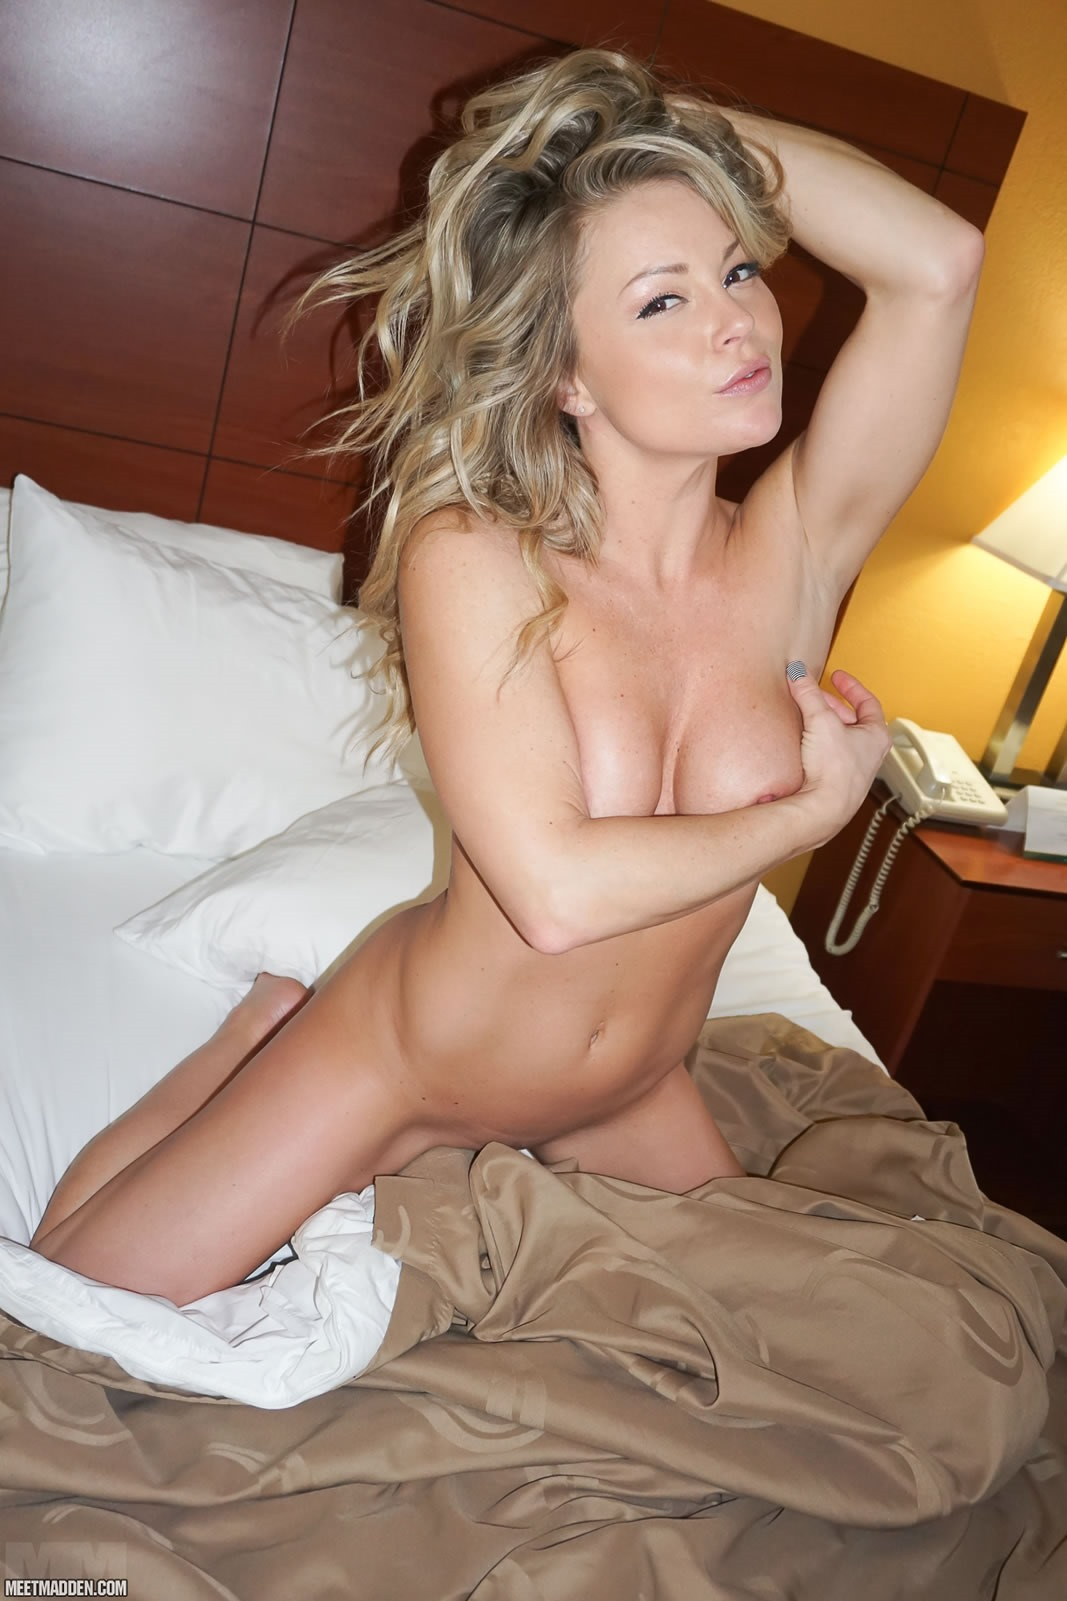 Meet naked